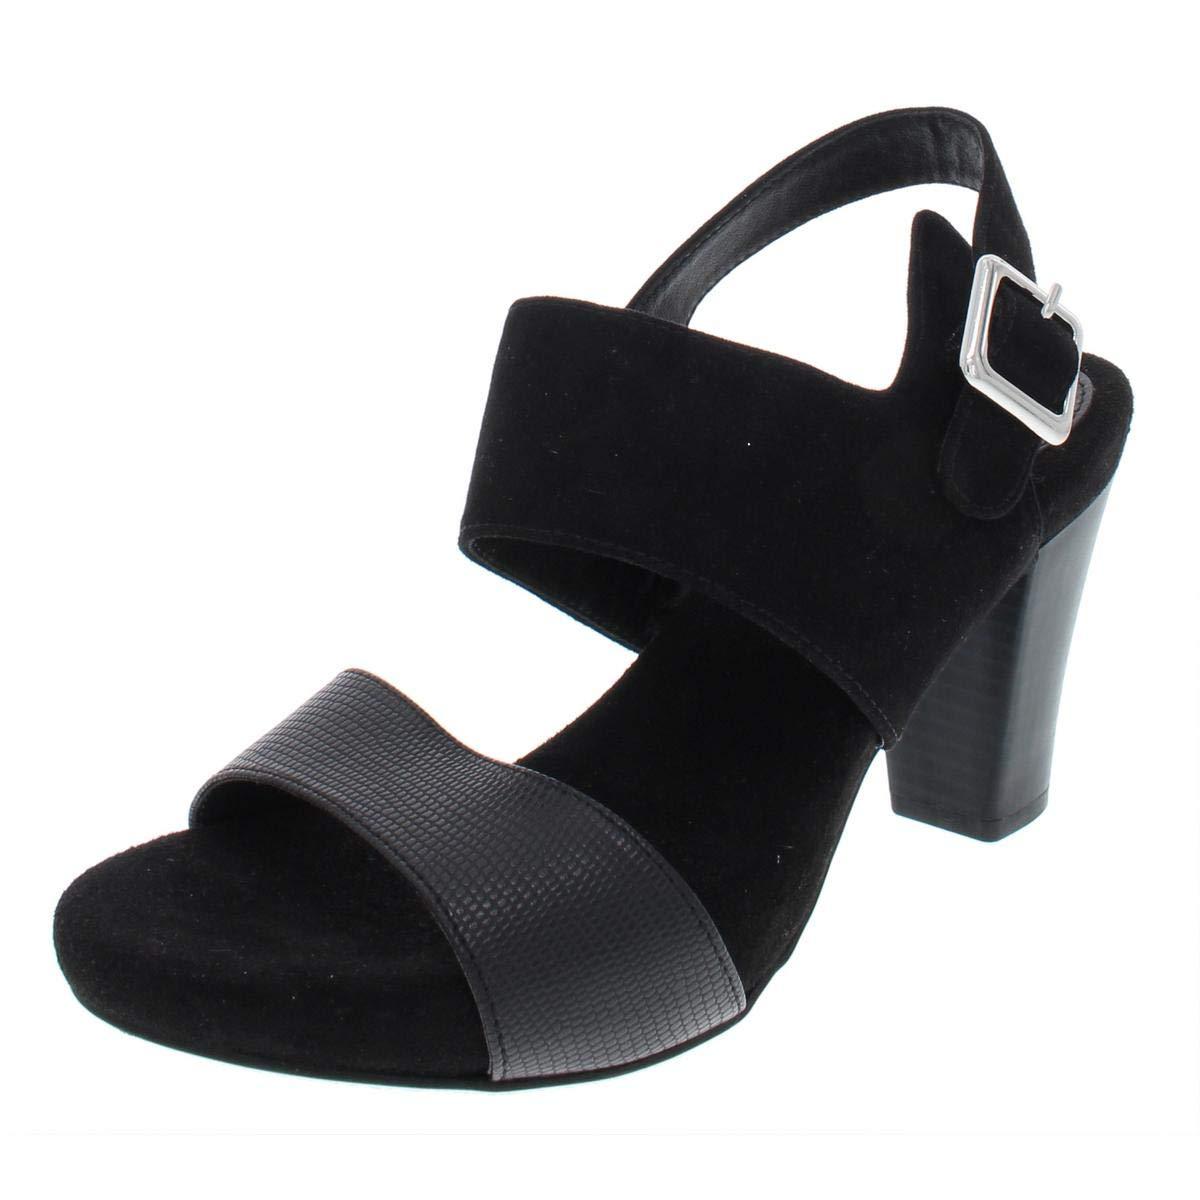 Black Giani Bernini GB35 Aikko2 Ankle Strap Buckle Sandals, Dark Taupe